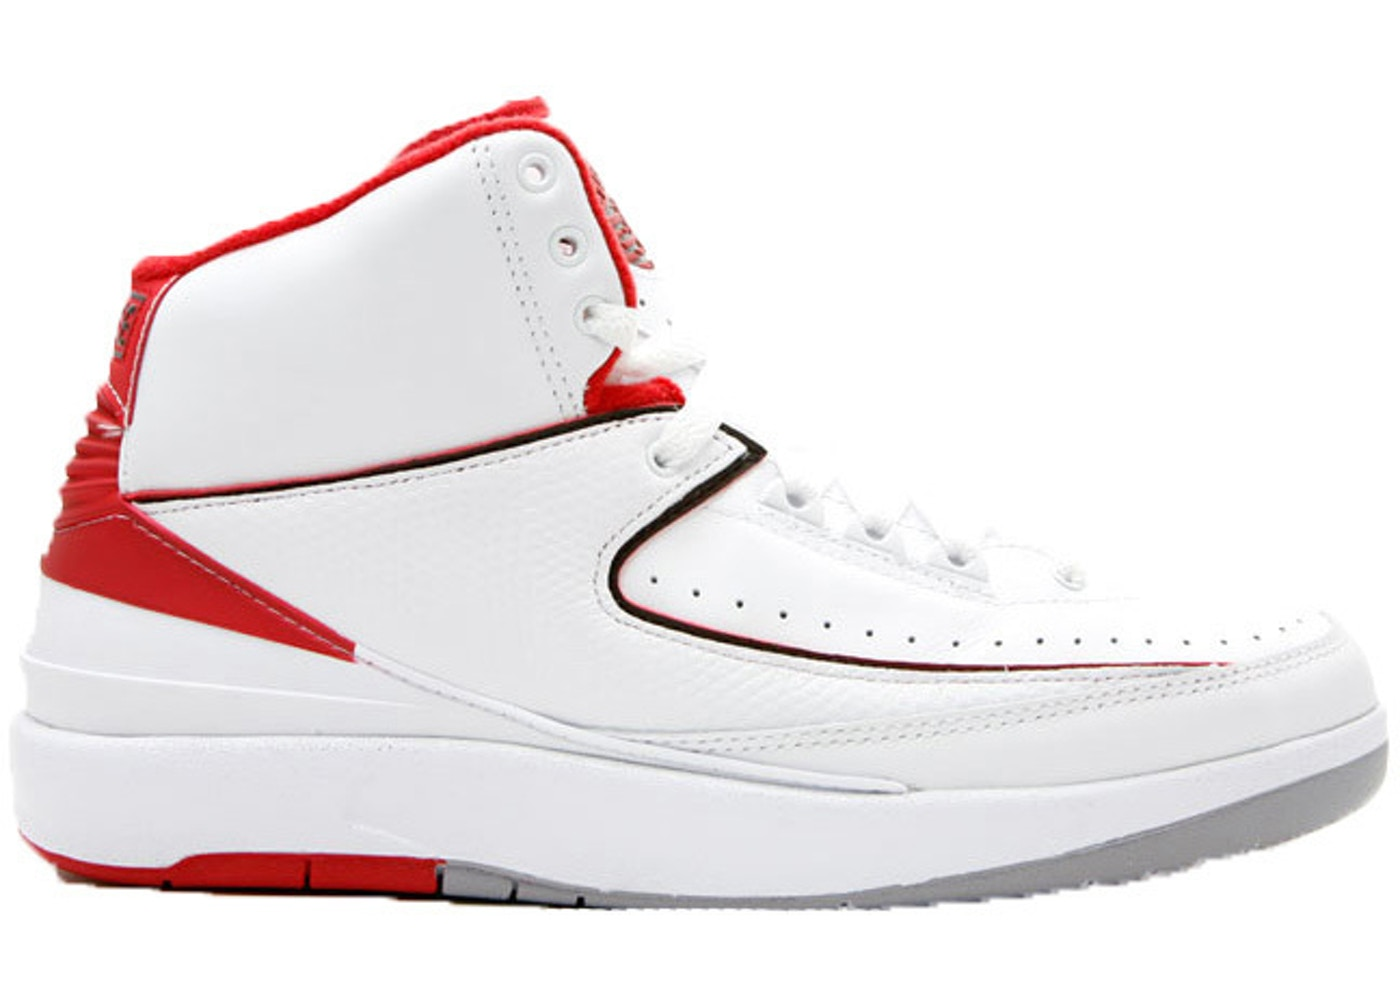 39d0925f006 Jordan 2 Retro White Red CDP (2008) - 308308-162